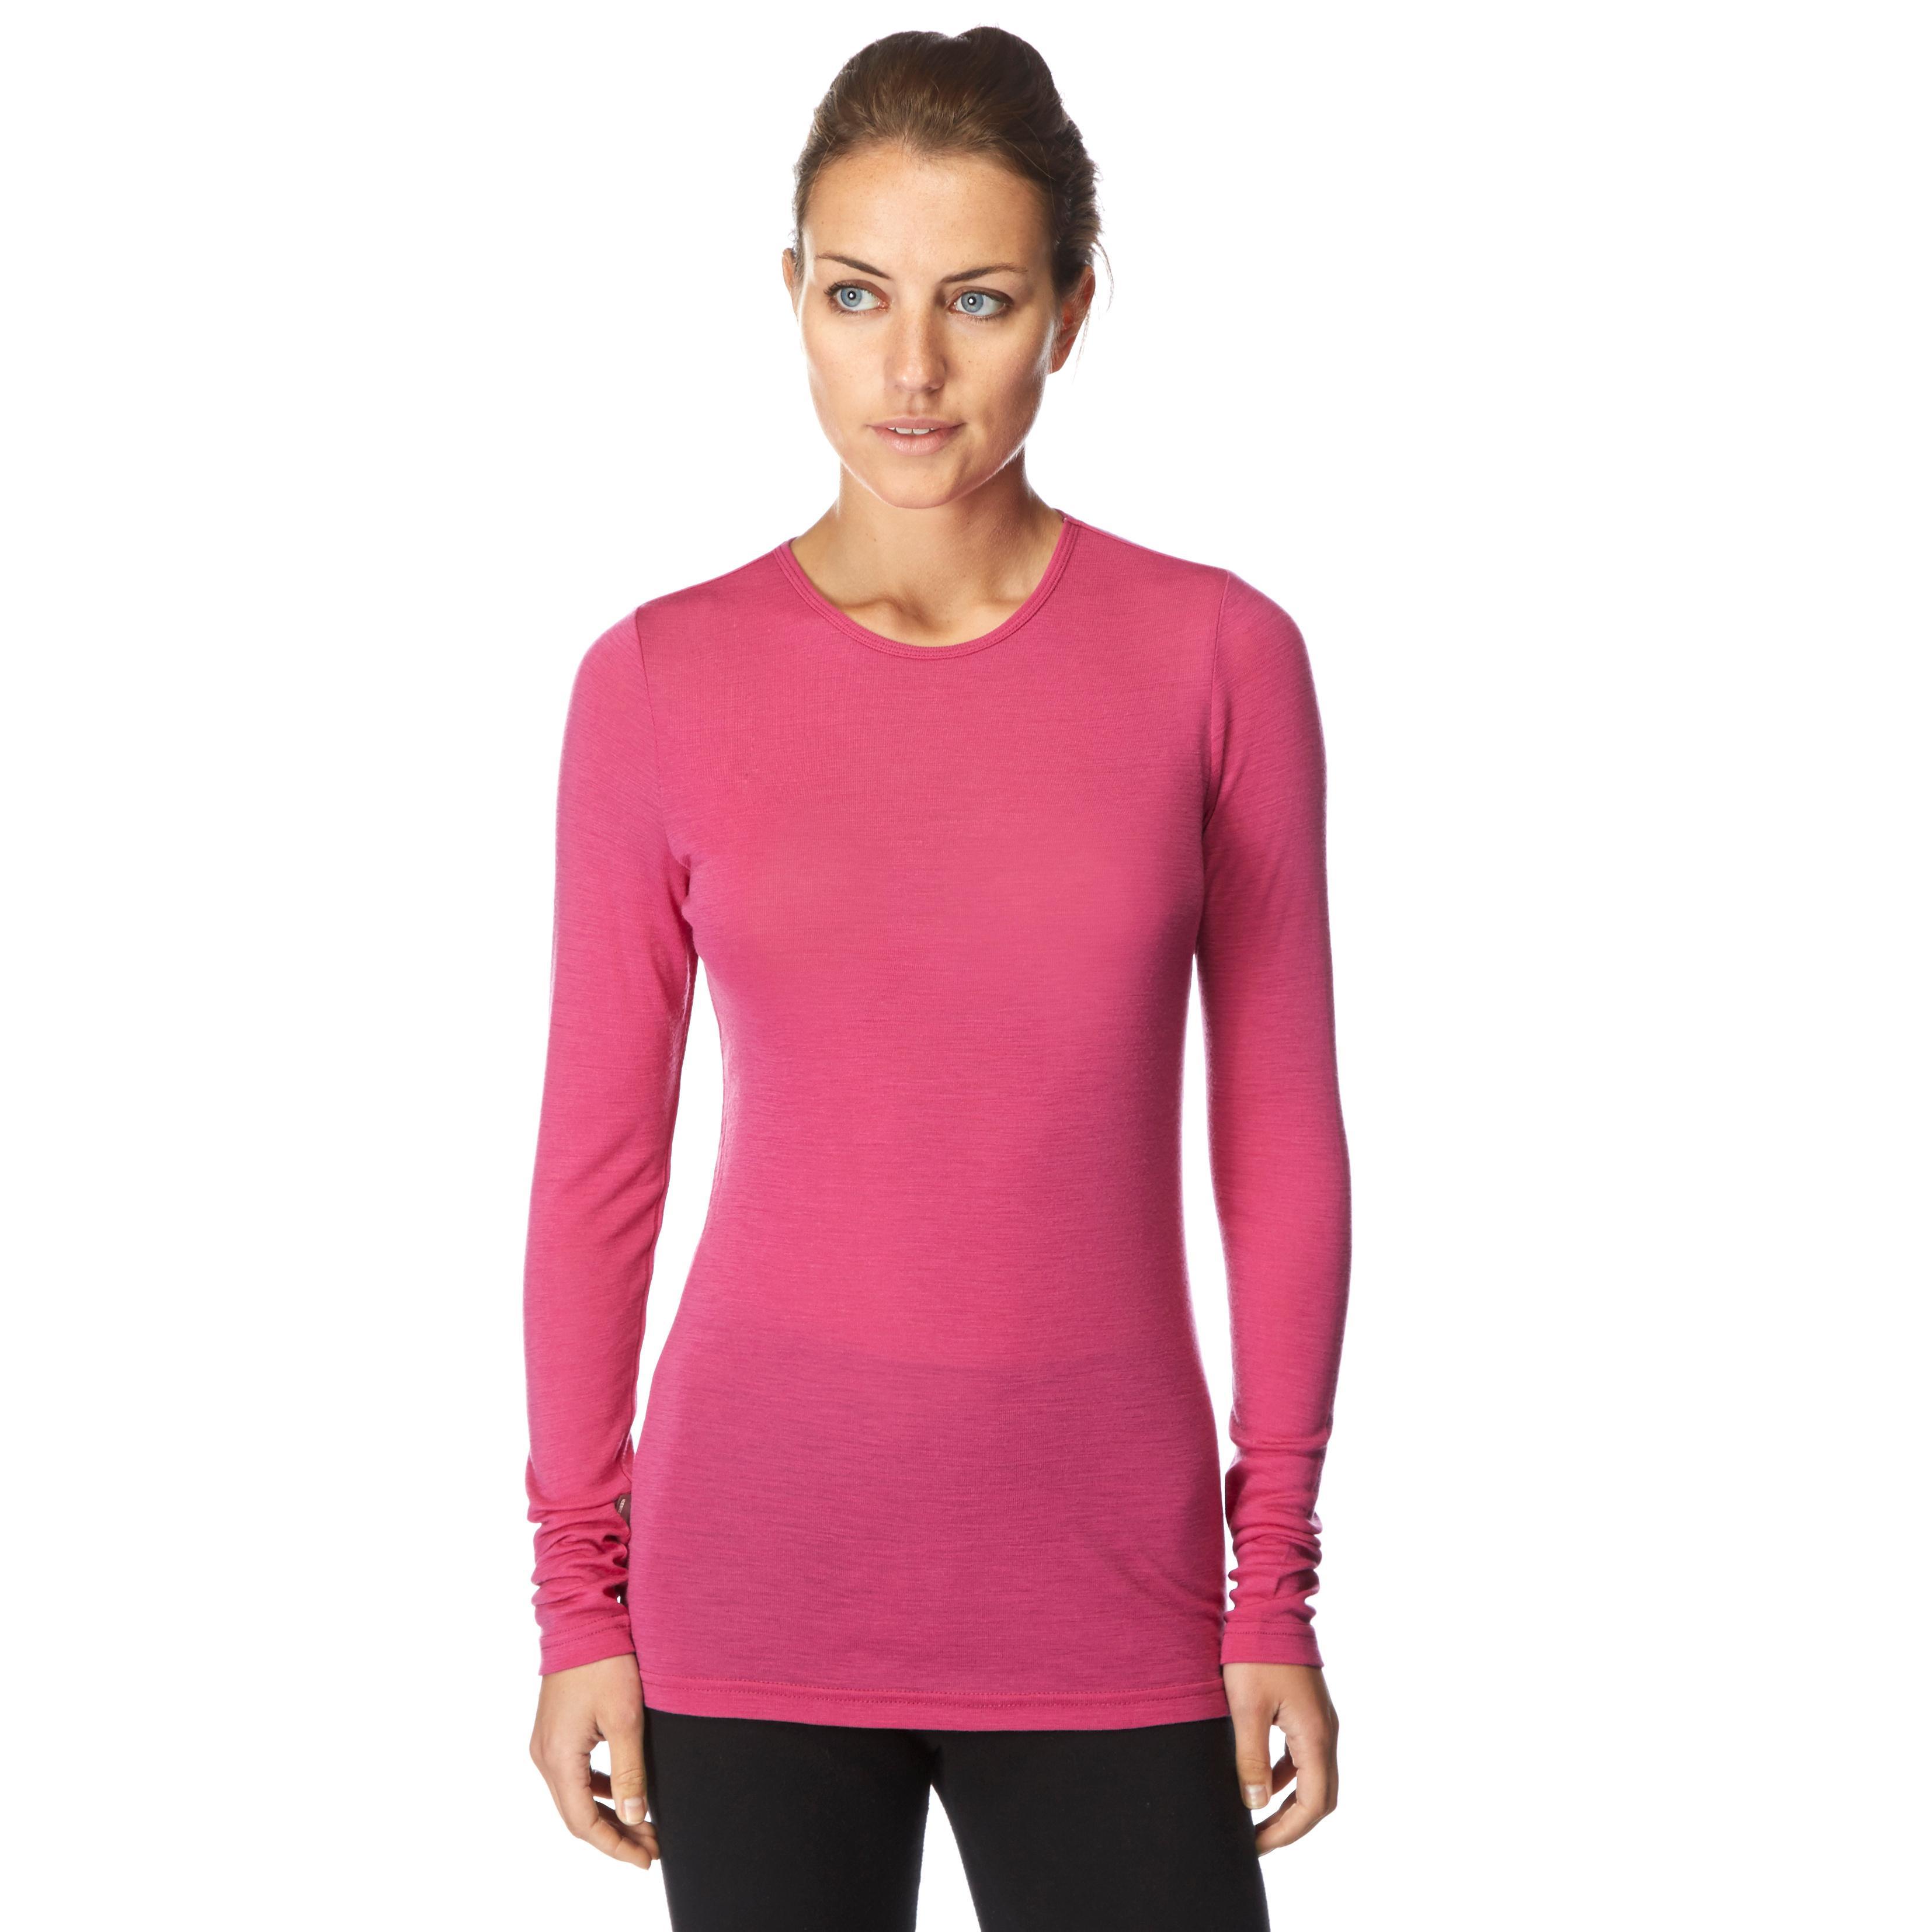 Icebreaker Womens Everyday Long Sleeve Crew Baselayer Pink